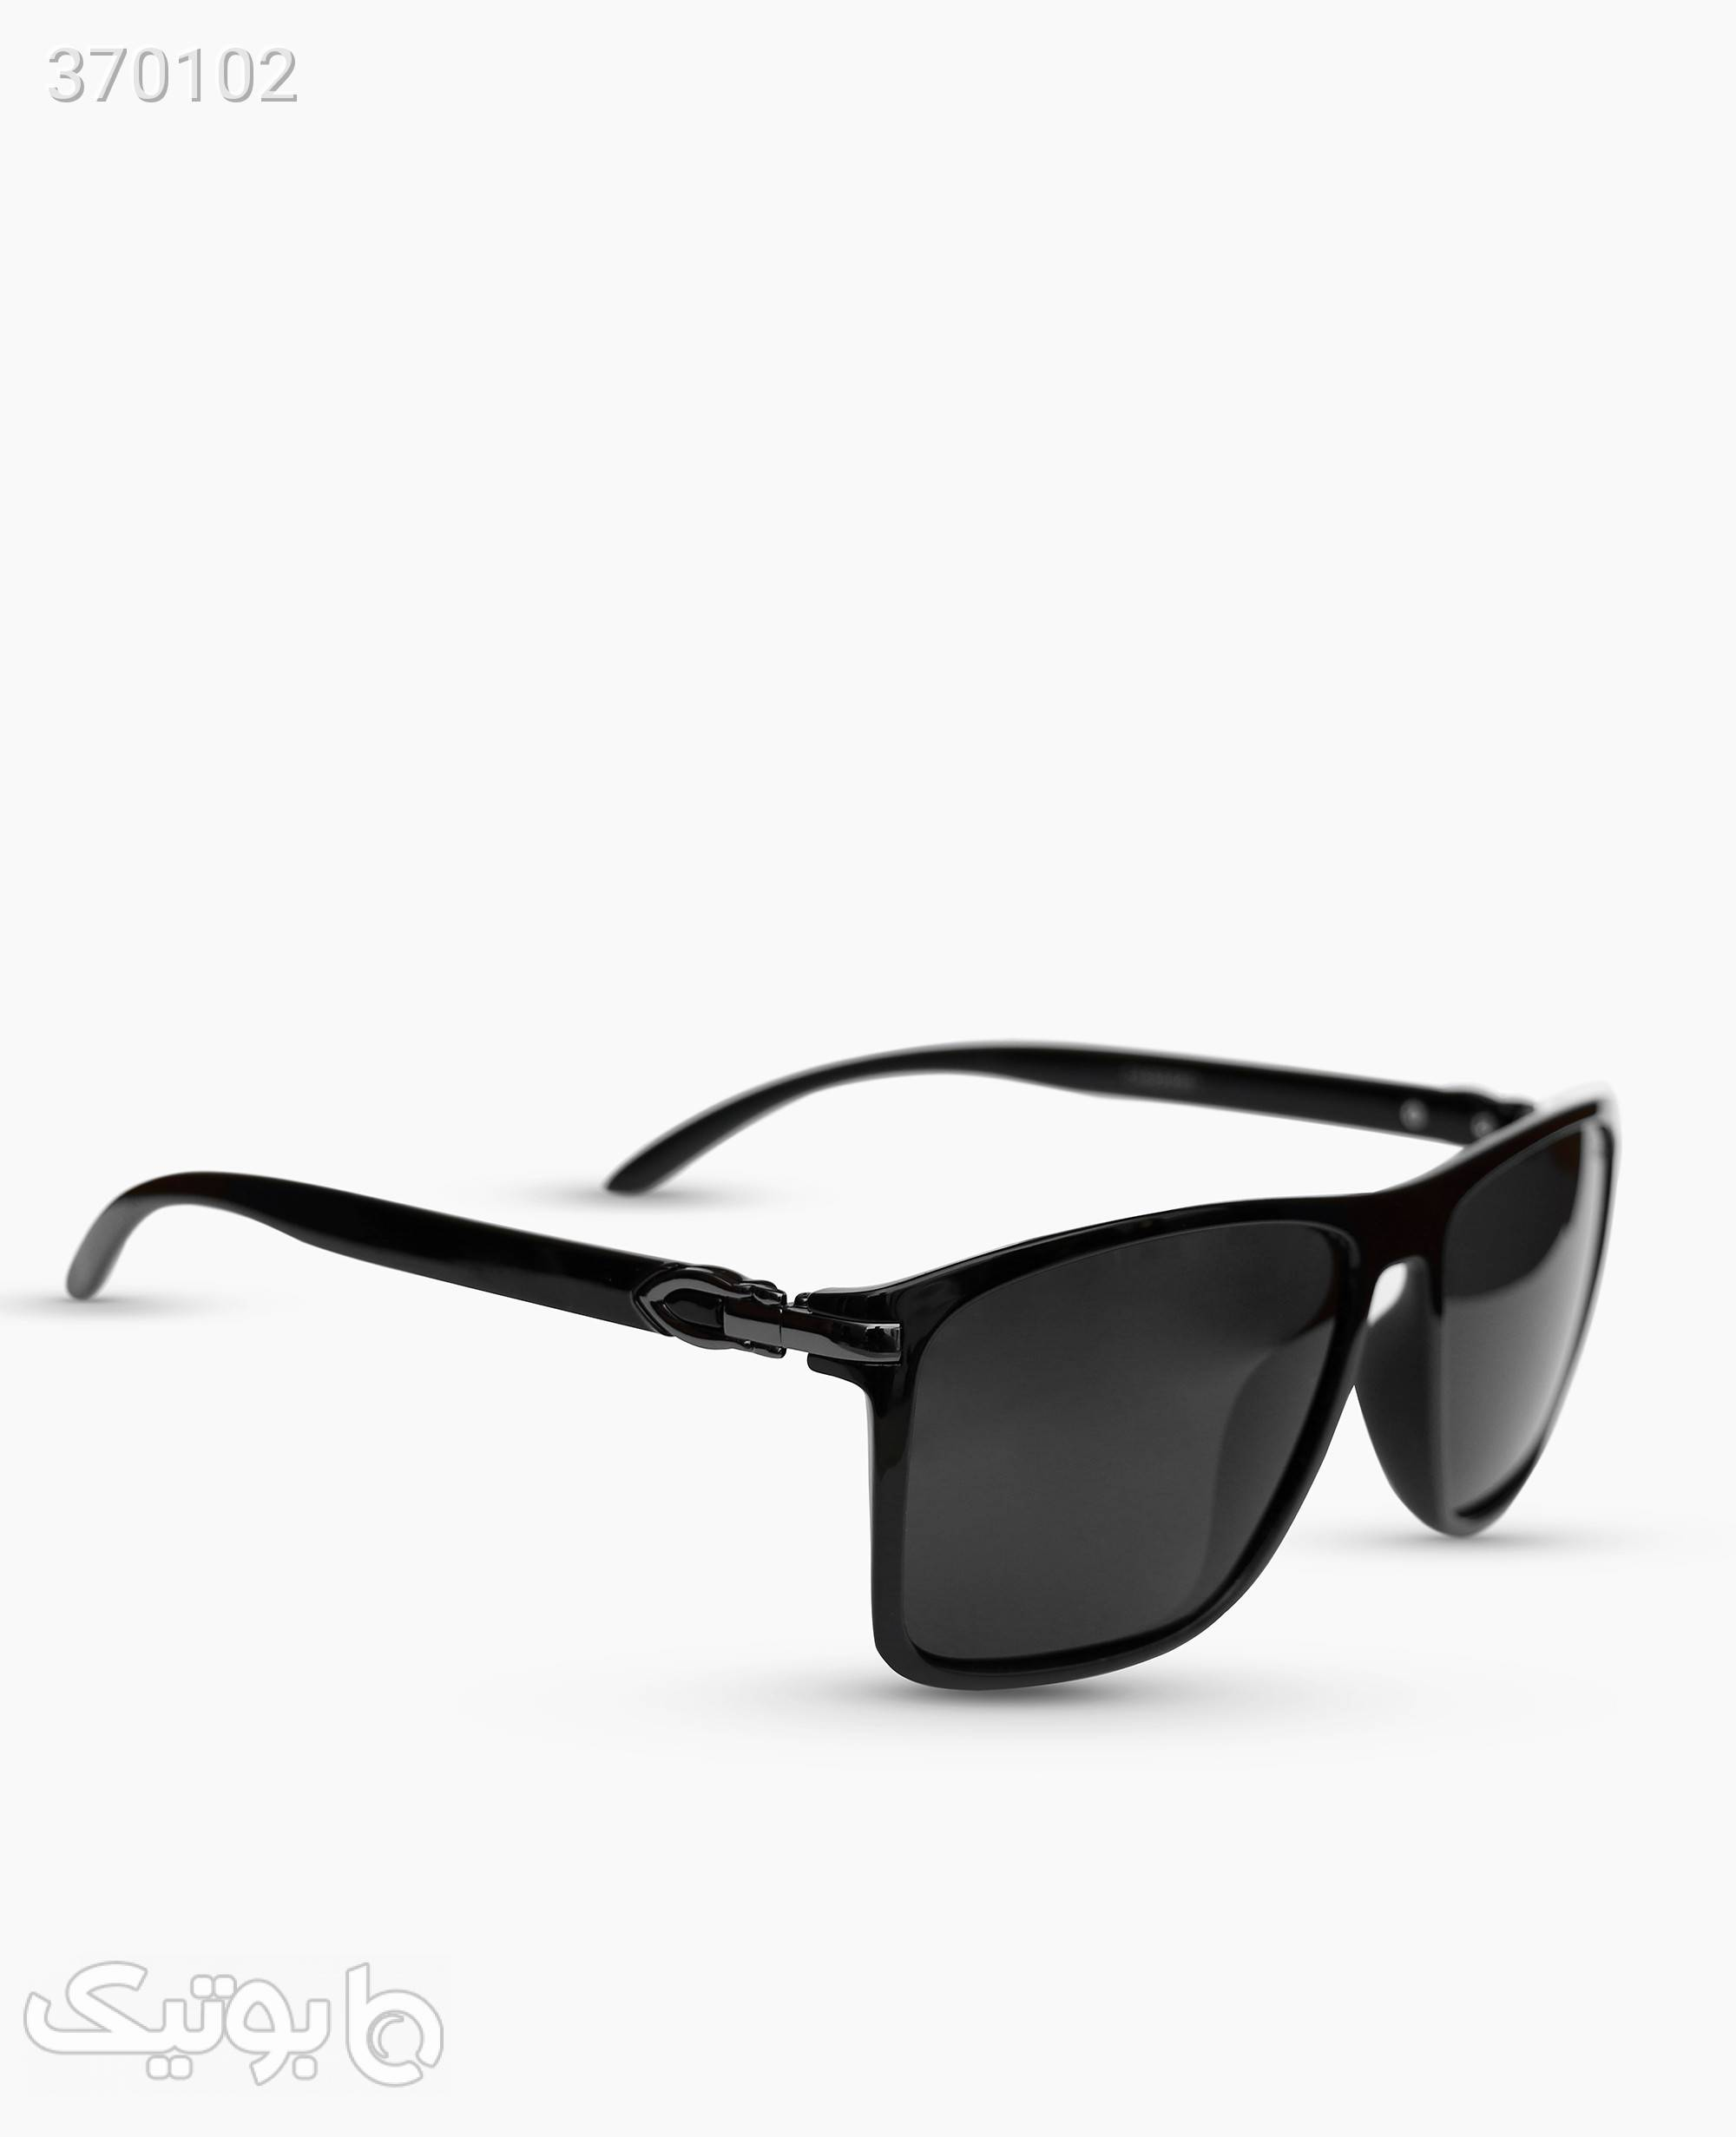 عینک آفتابی Cartier کد 0081 مشکی عینک آفتابی